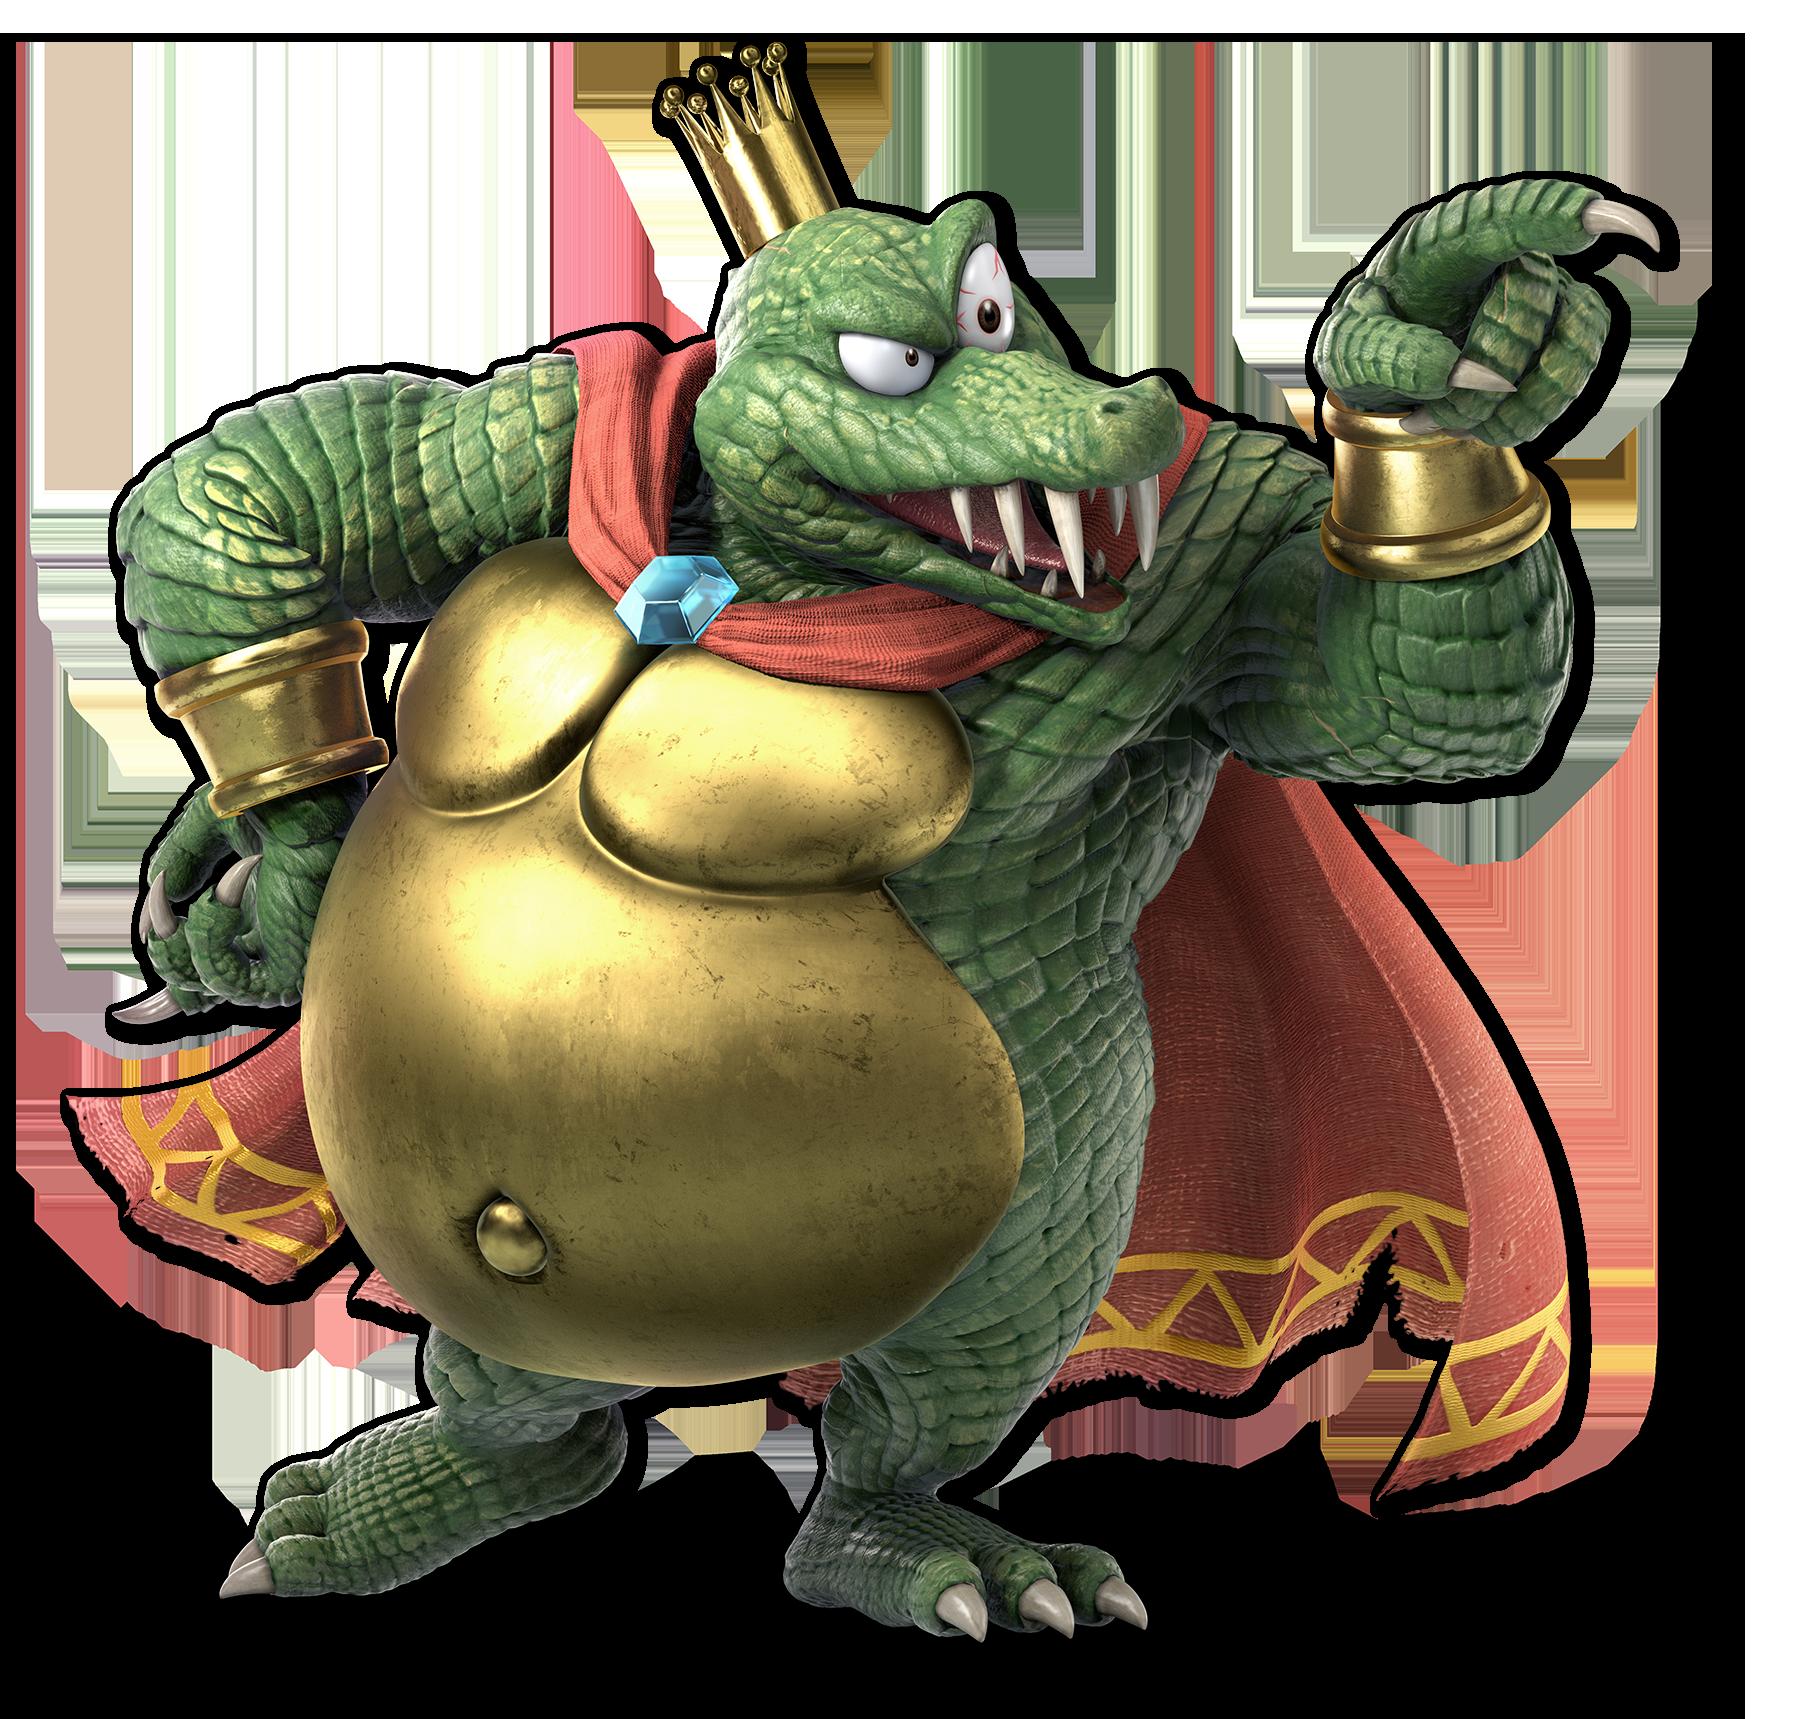 King K. Rool (Ultimate)